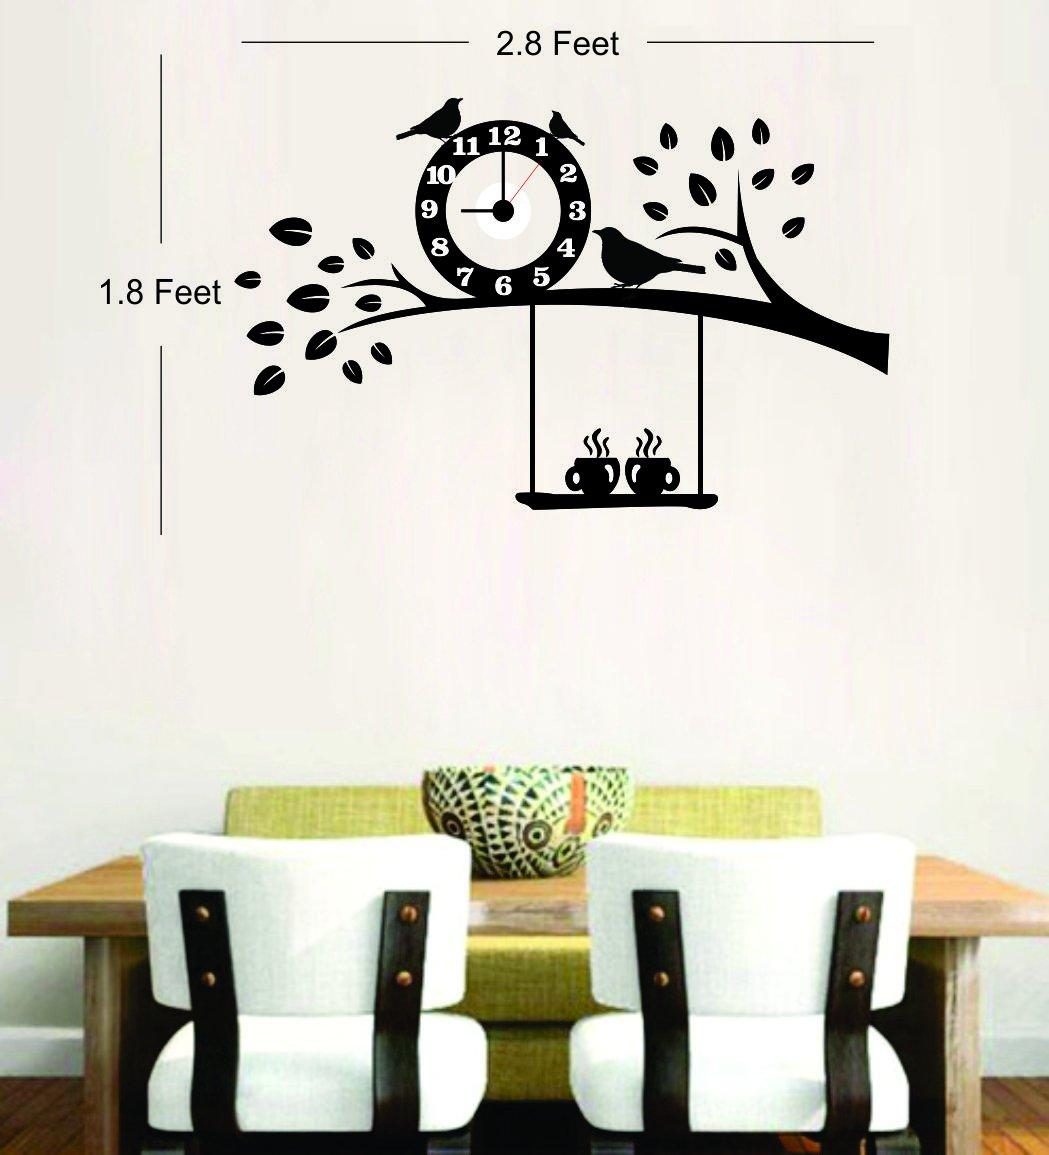 buy syga black tree and bird pvc vinyl wall clock 35 cm x 17 cm x buy syga black tree and bird pvc vinyl wall clock 35 cm x 17 cm x 5 cm online at low prices in india amazon in